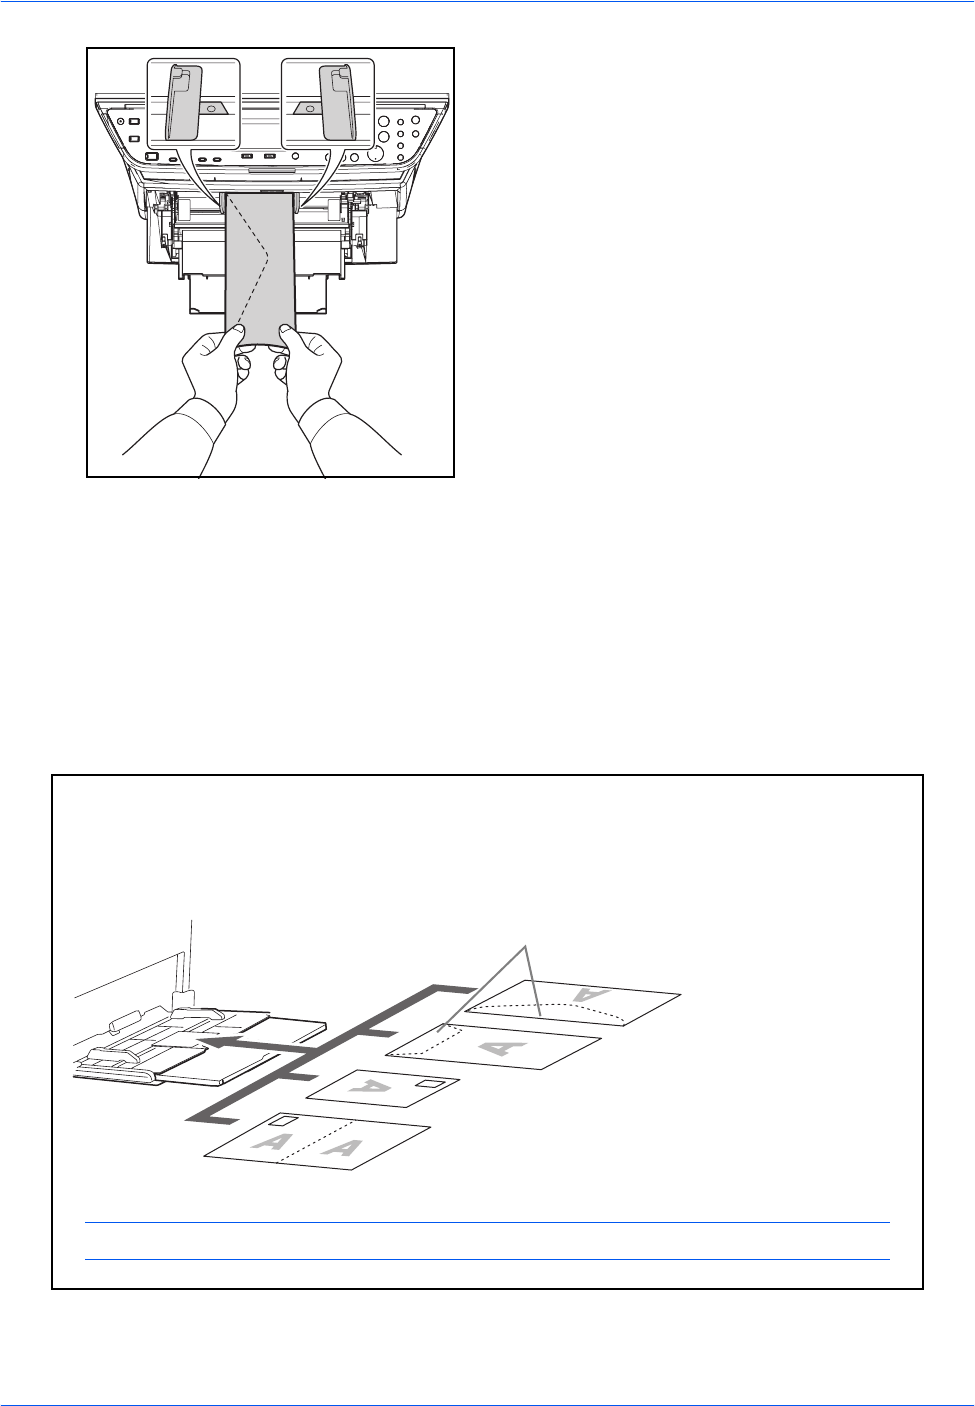 Kyocera FS 1128MFP 1028MFP/FS User Manual To The A2cb7774